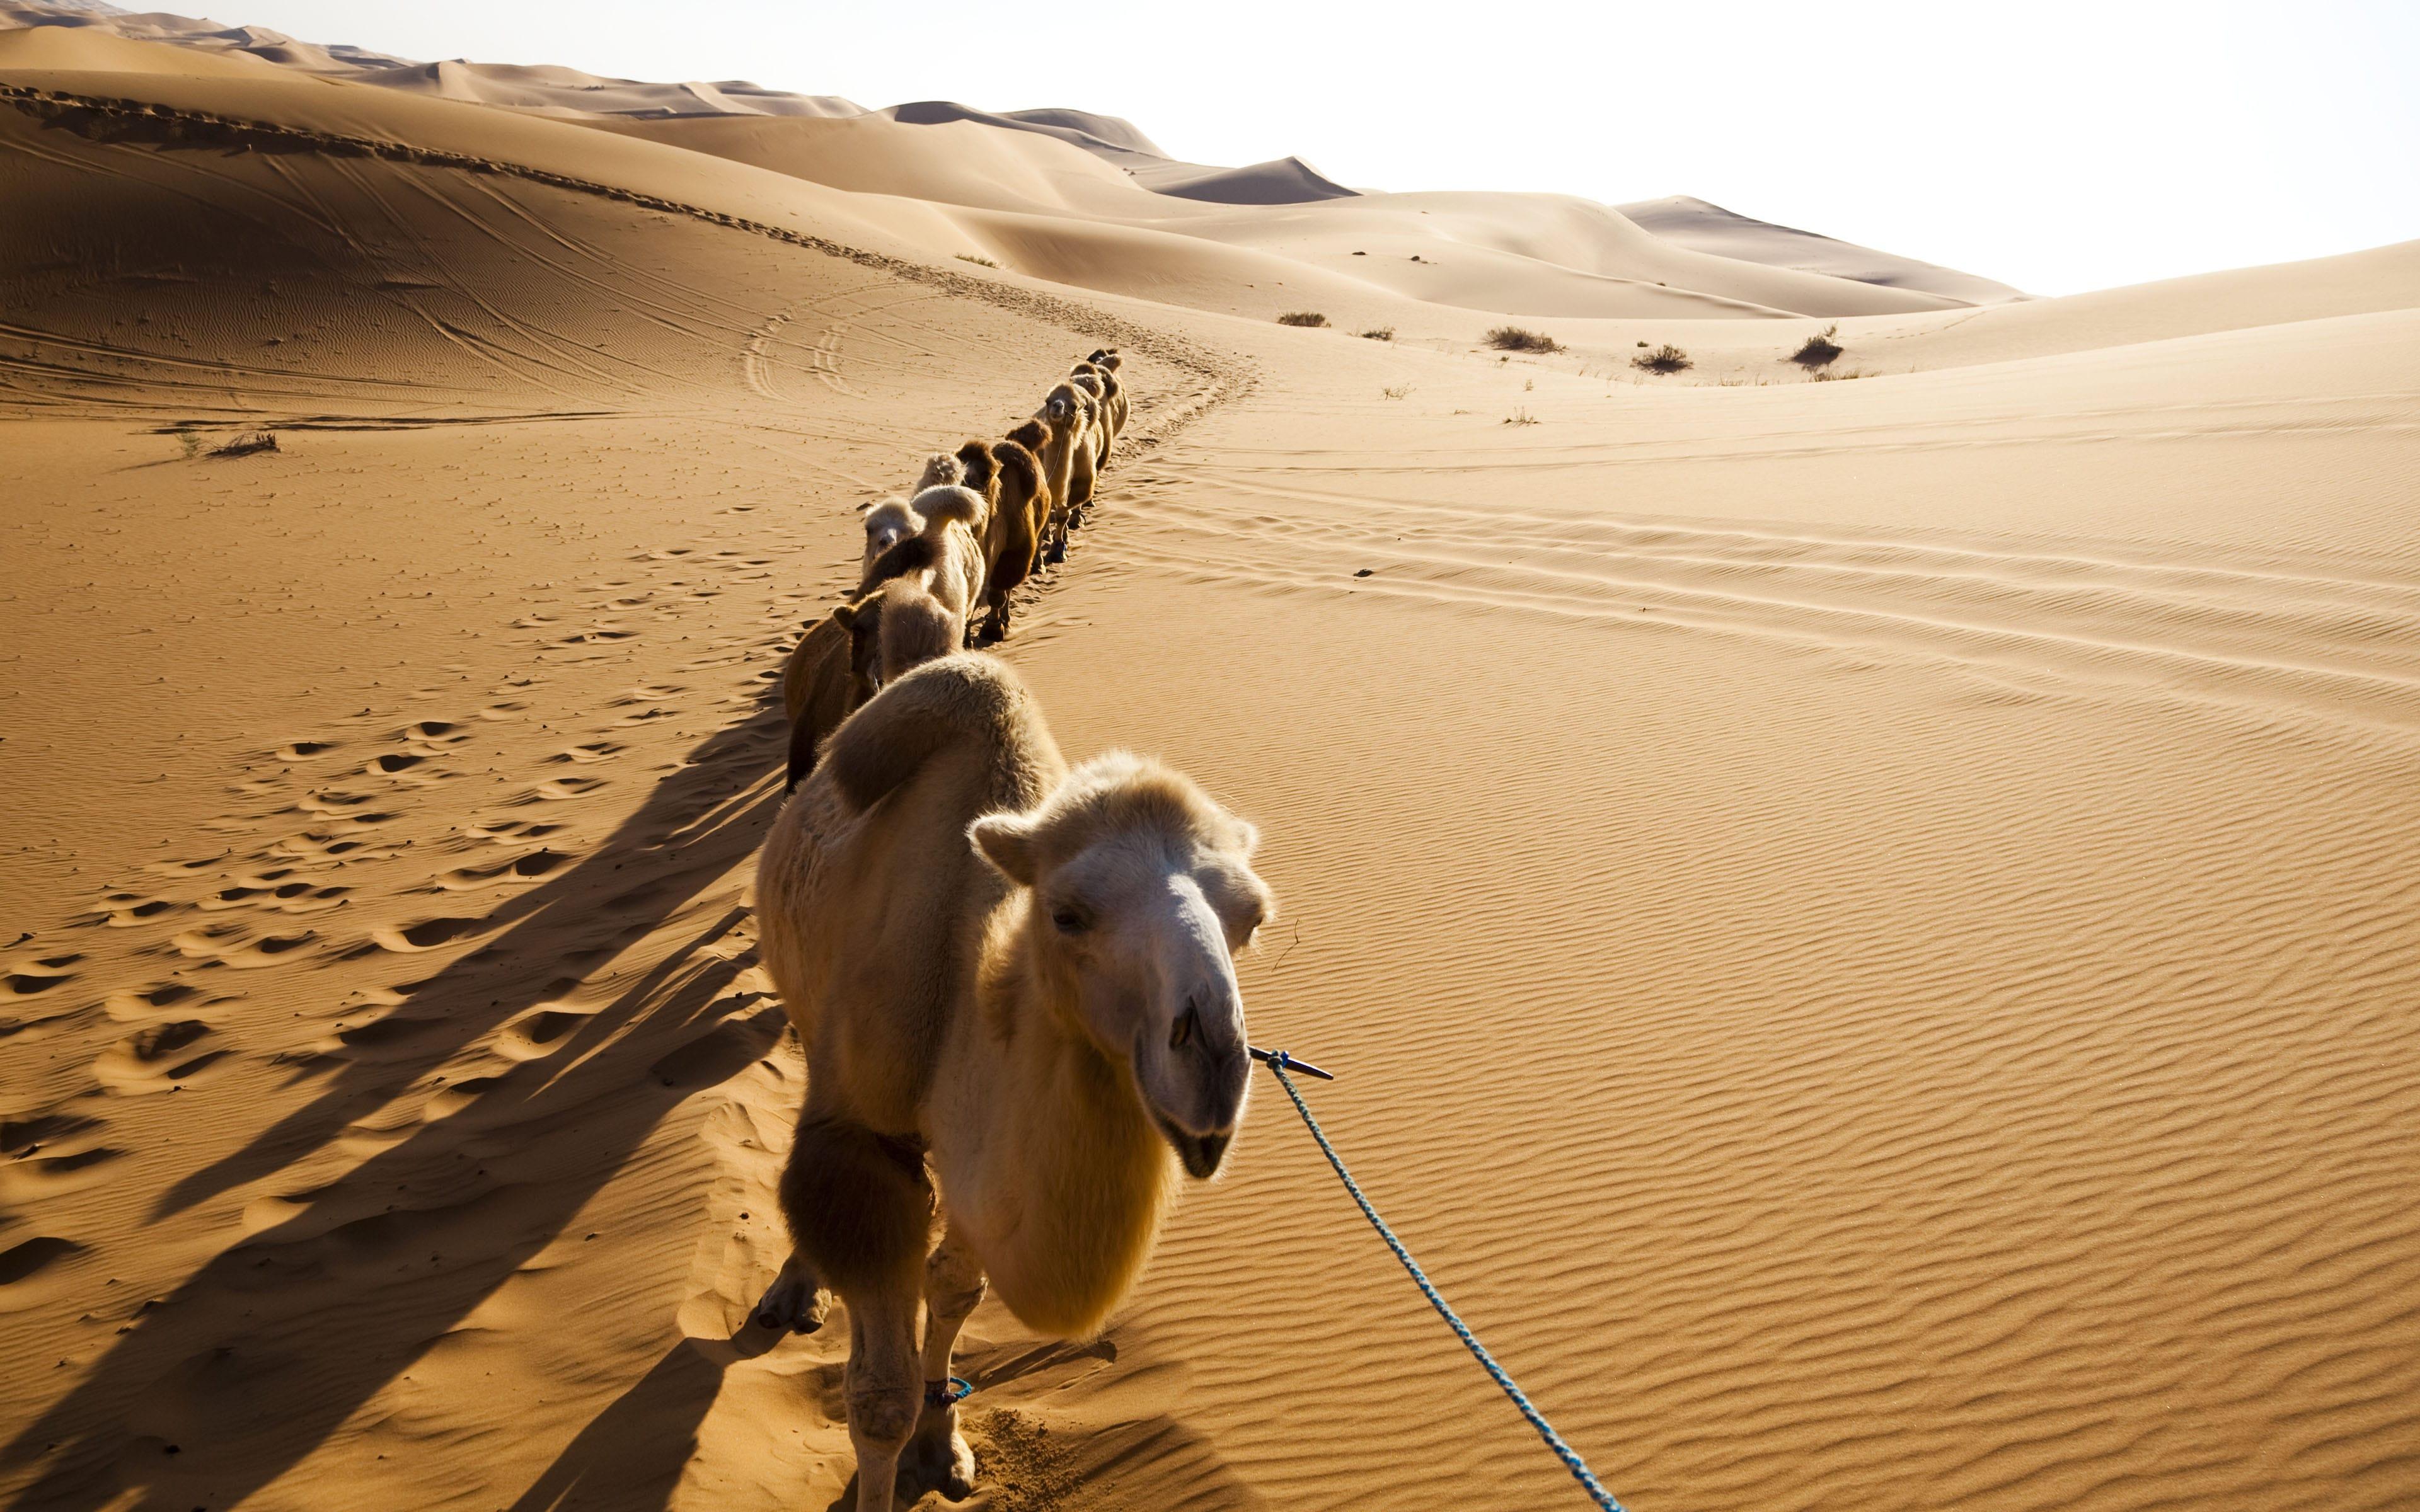 Camel High quality